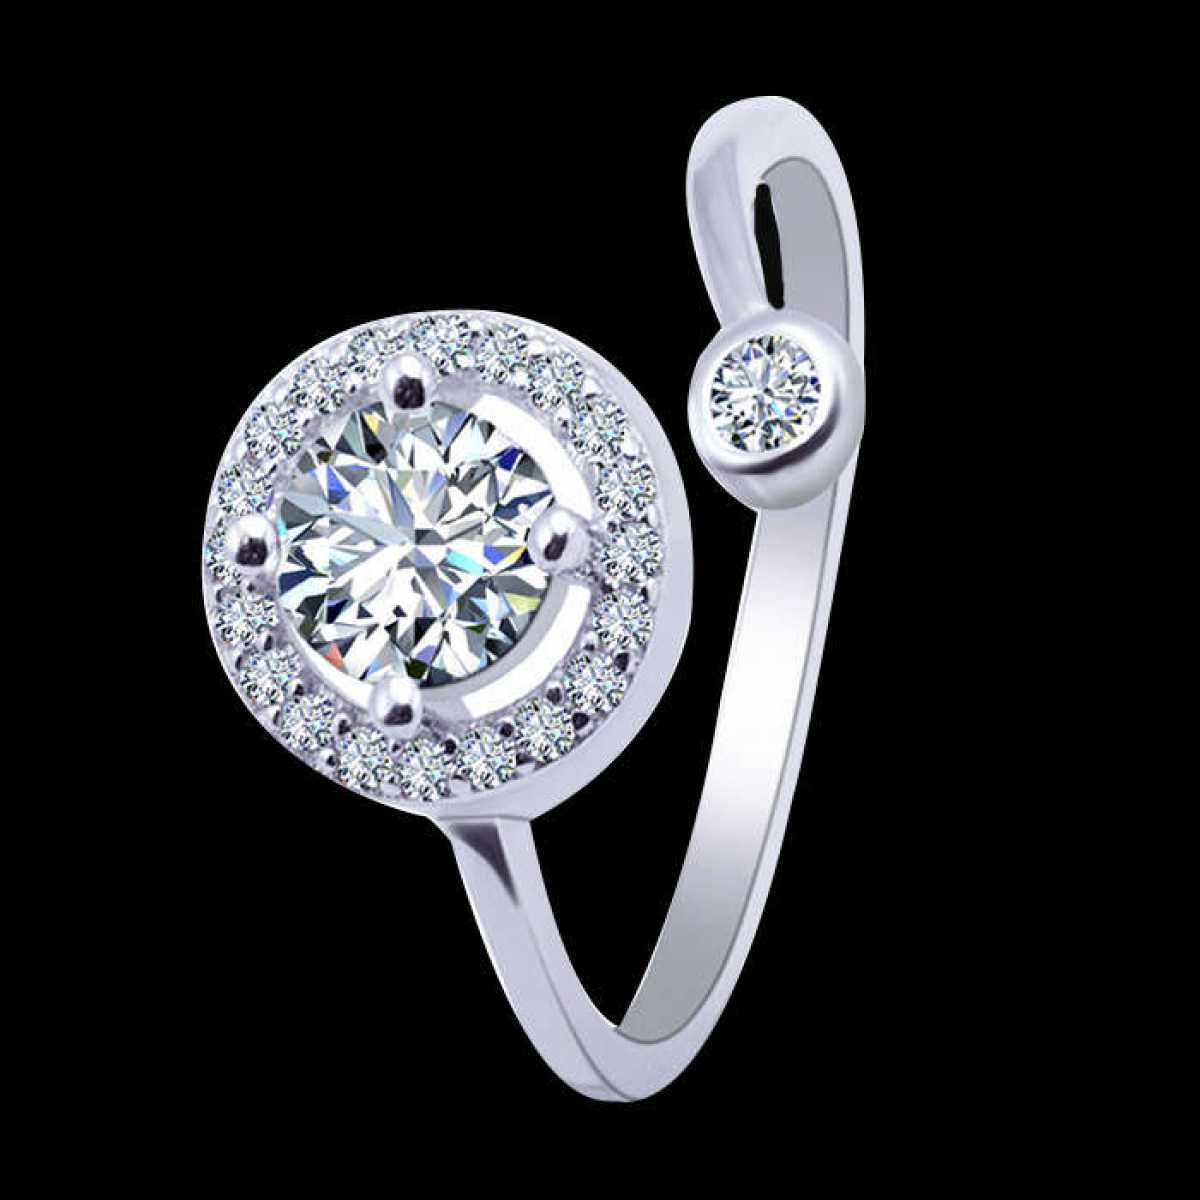 Diamond in Circle Silver Ring